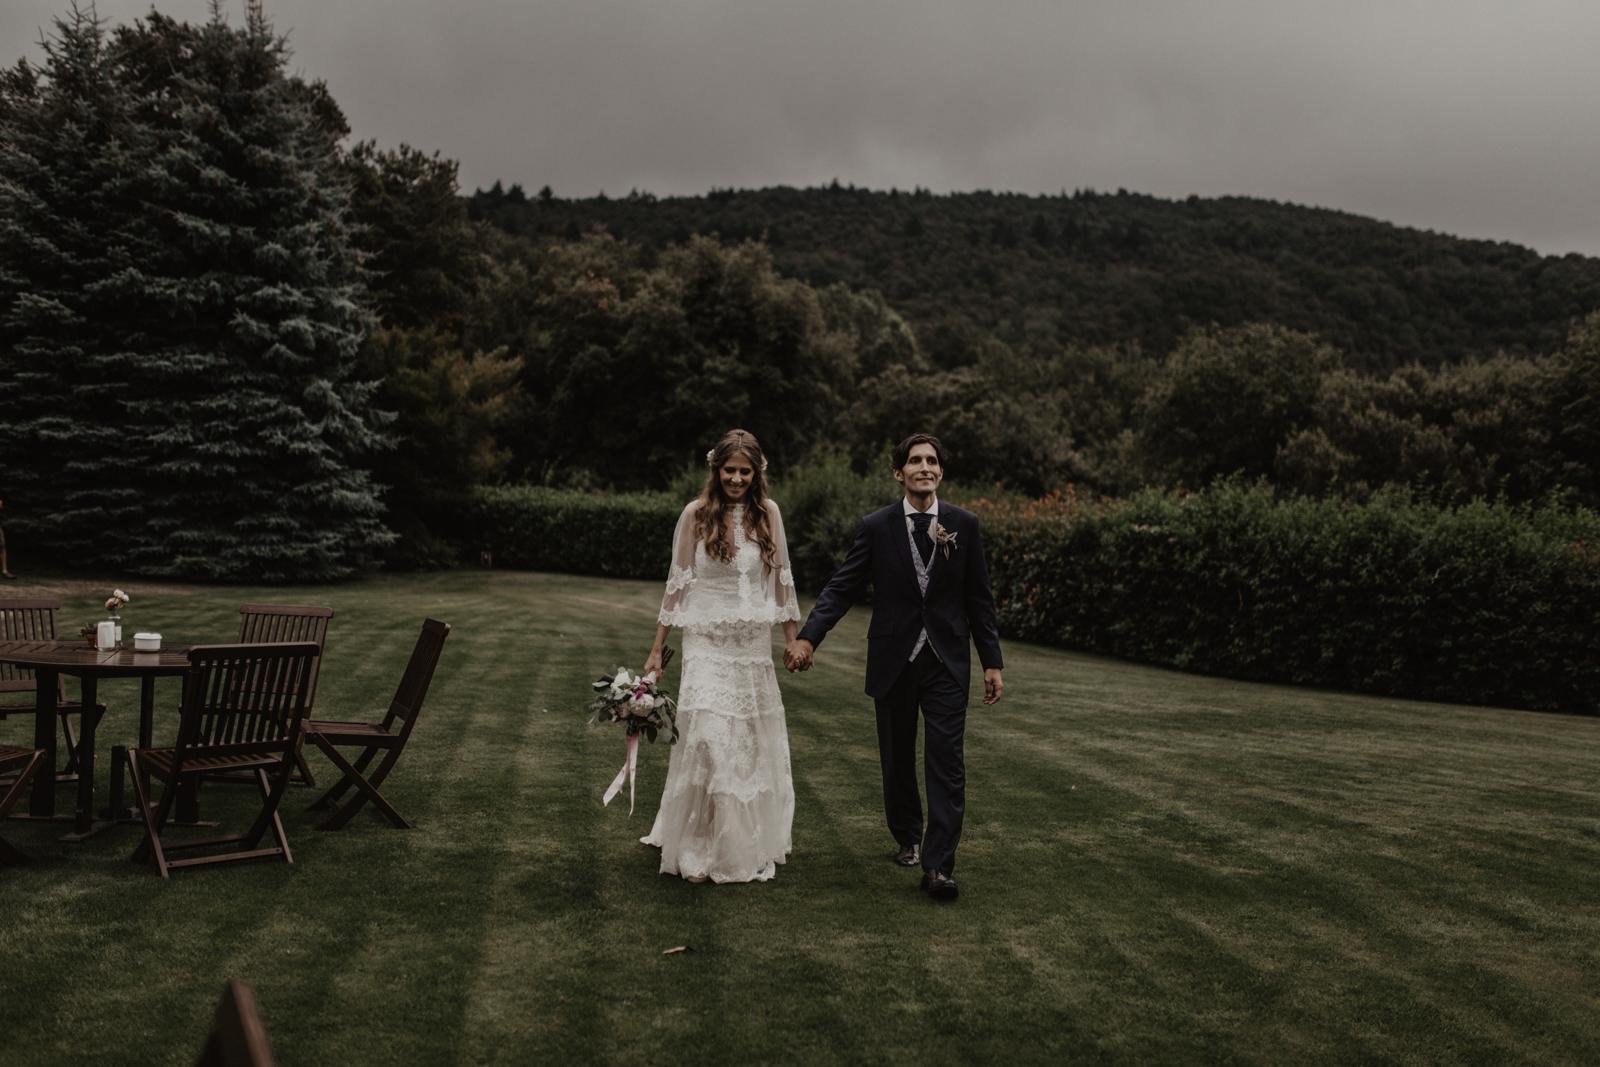 thenortherngirlphotography_photography_thenortherngirl_rebeccascabros_wedding_weddingphotography_weddingphotographer_barcelona_bodaenbarcelona_bodaenmaselmarti_bodarogeryvane-588.jpg